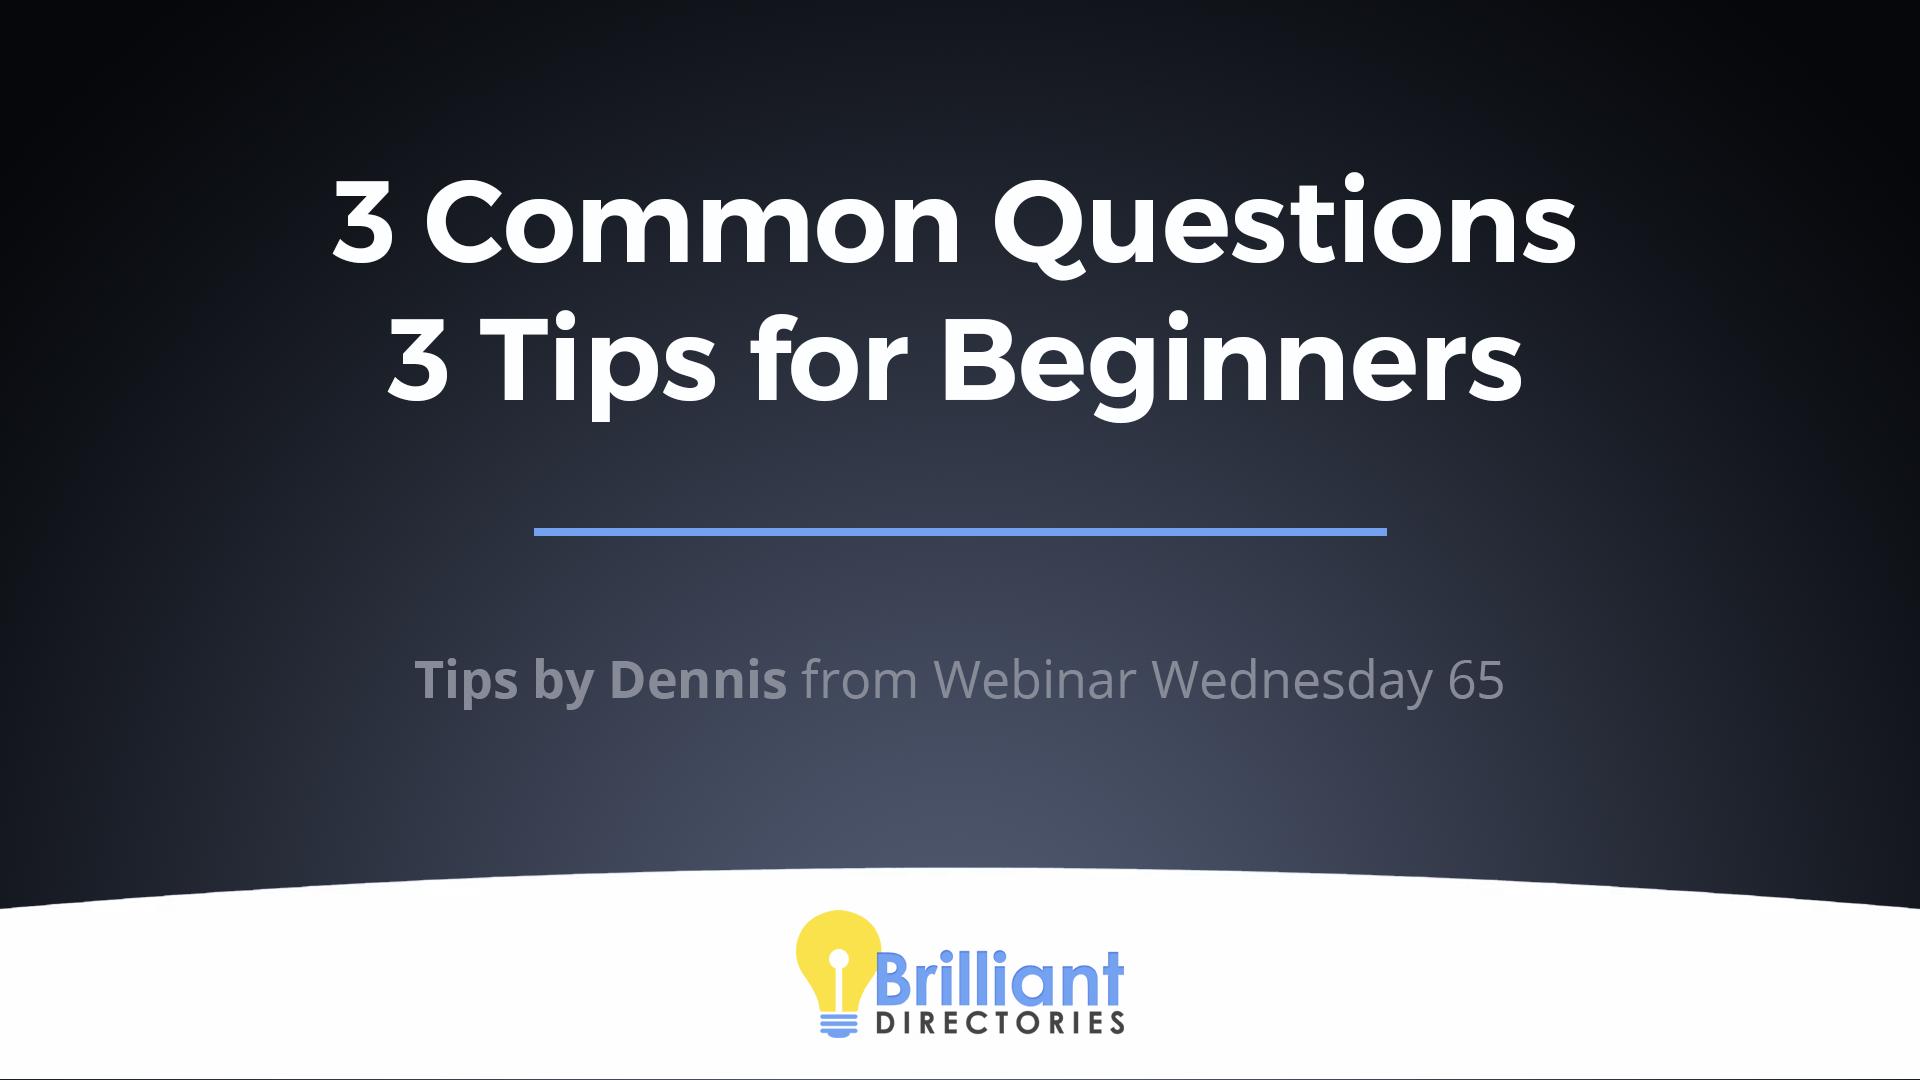 https://www.brilliantdirectories.com/blog/3-tips-for-starting-your-own-membership-website